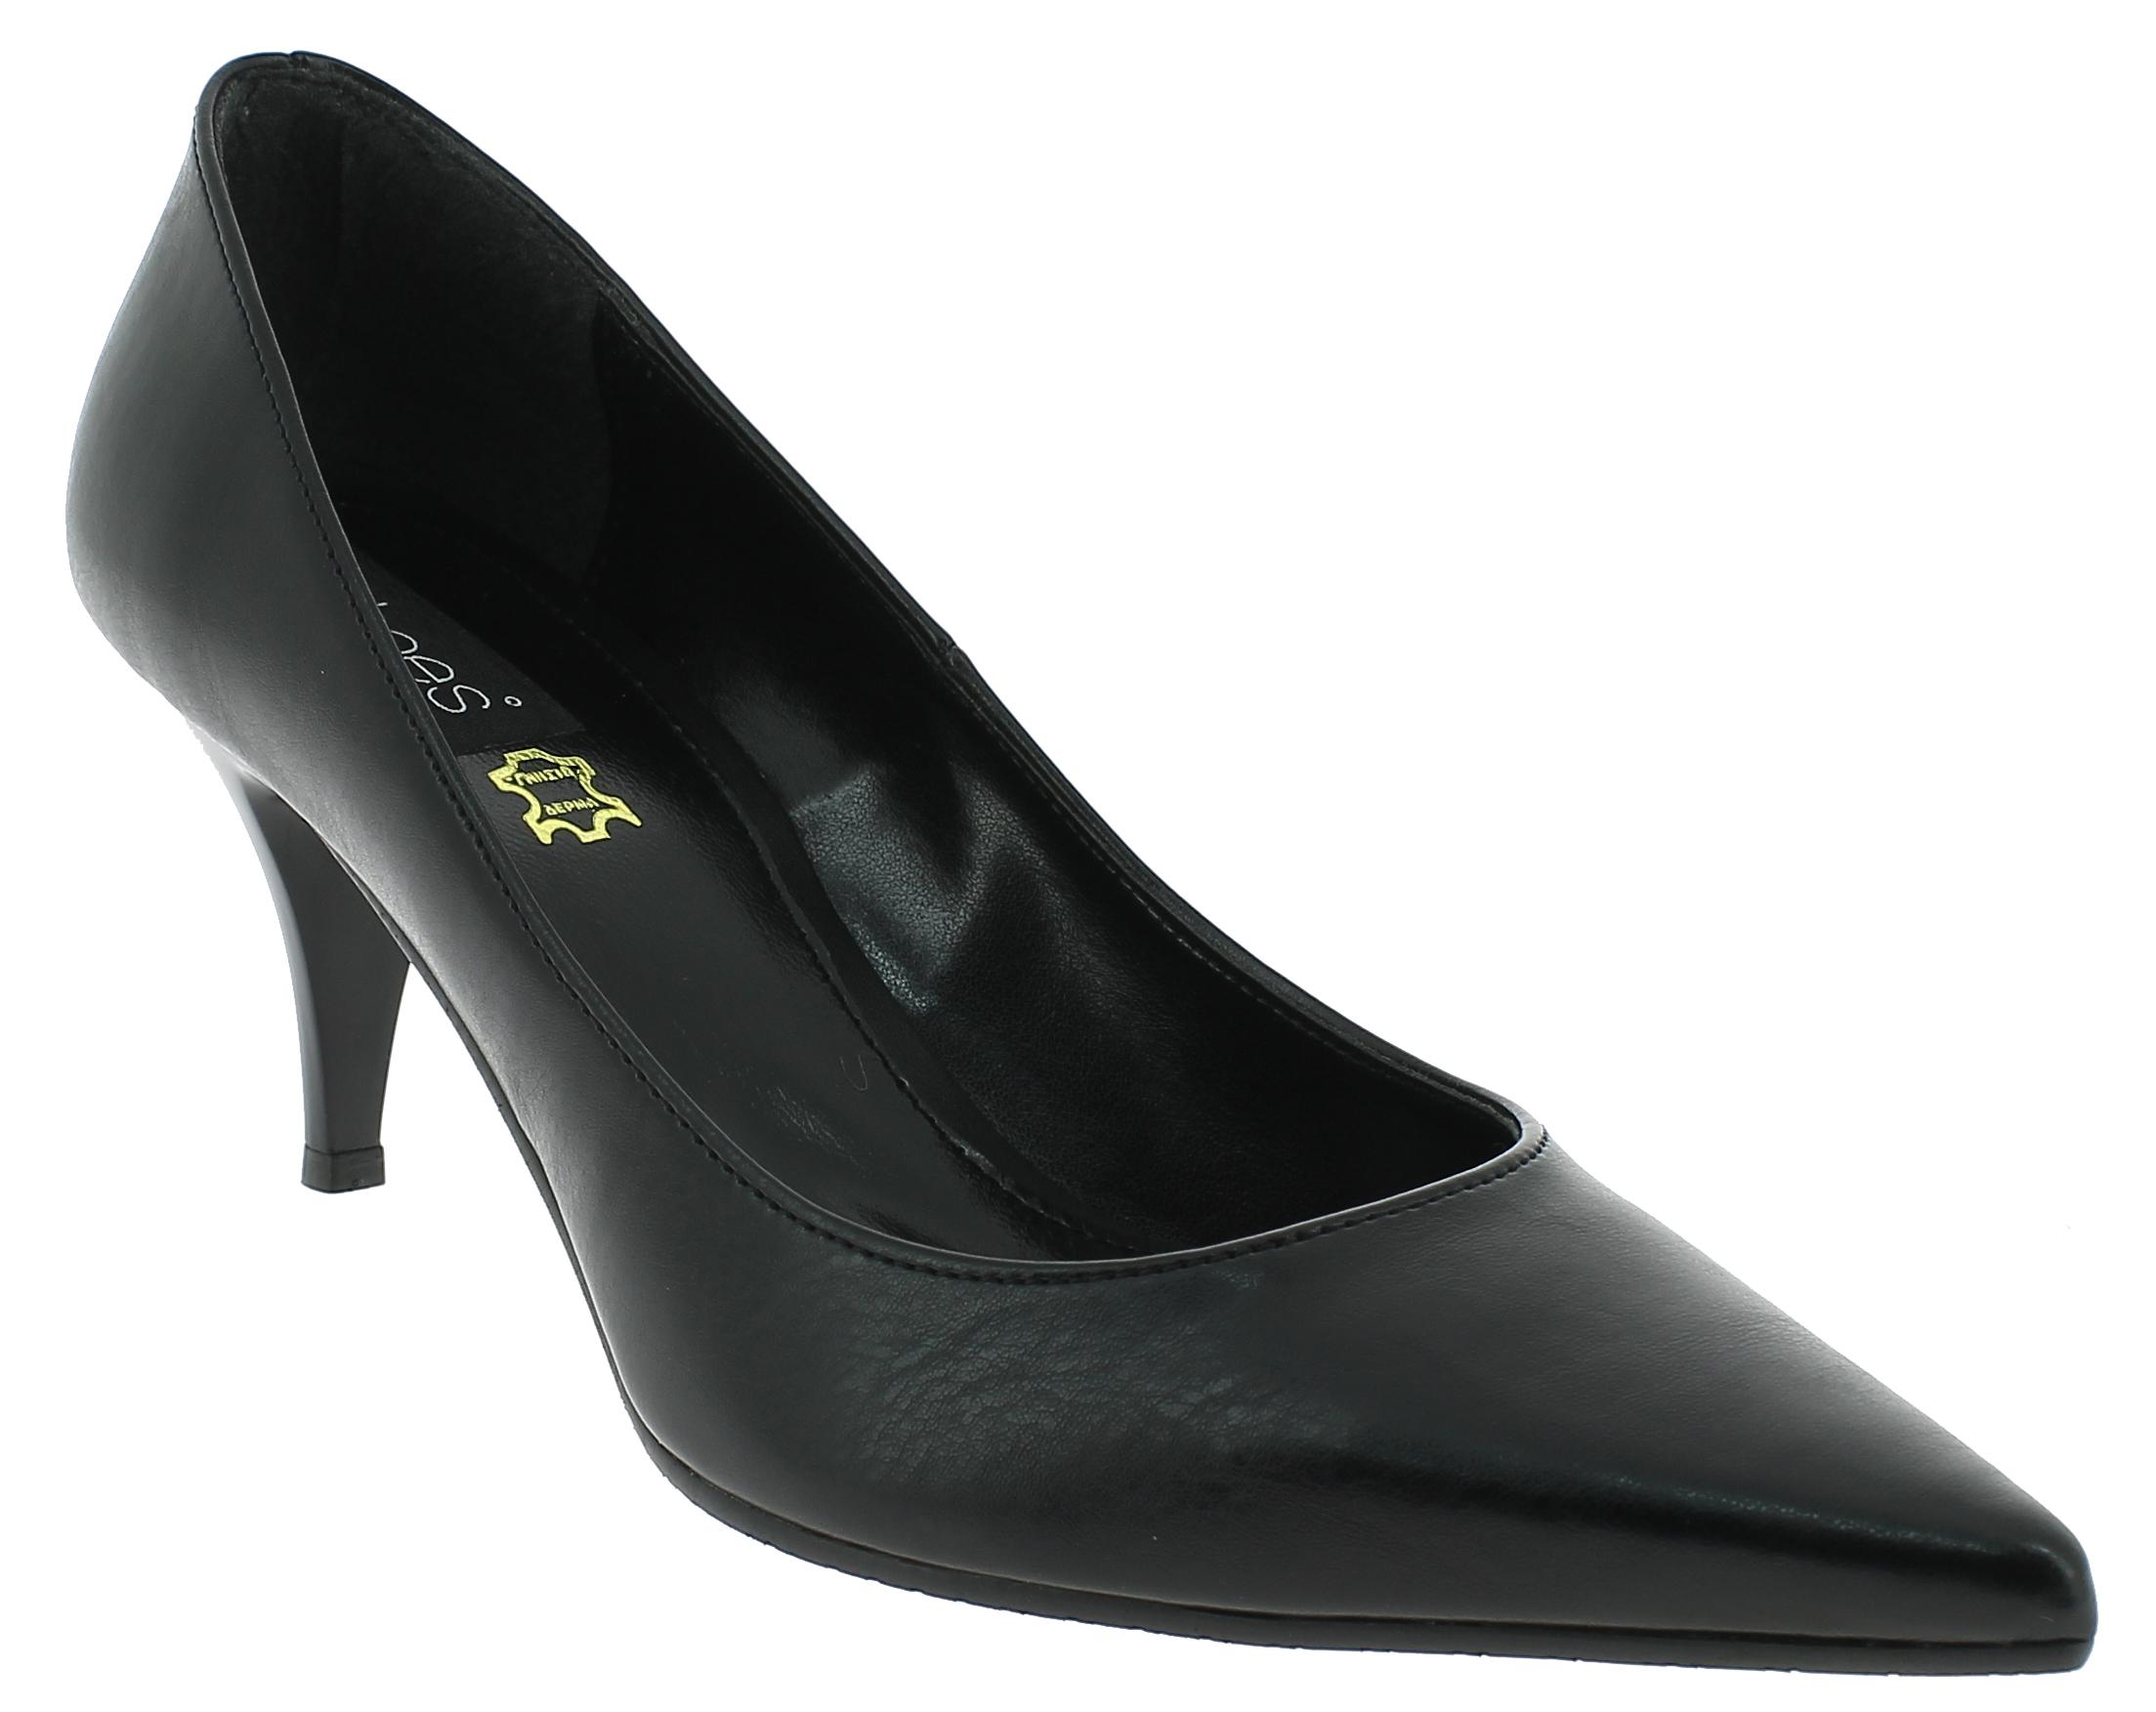 IQSHOES Γυναικεία Γόβα 590 Μαύρο - IqShoes - 41.590 BLACK black 37/1/15/27 παπούτσια  γόβες